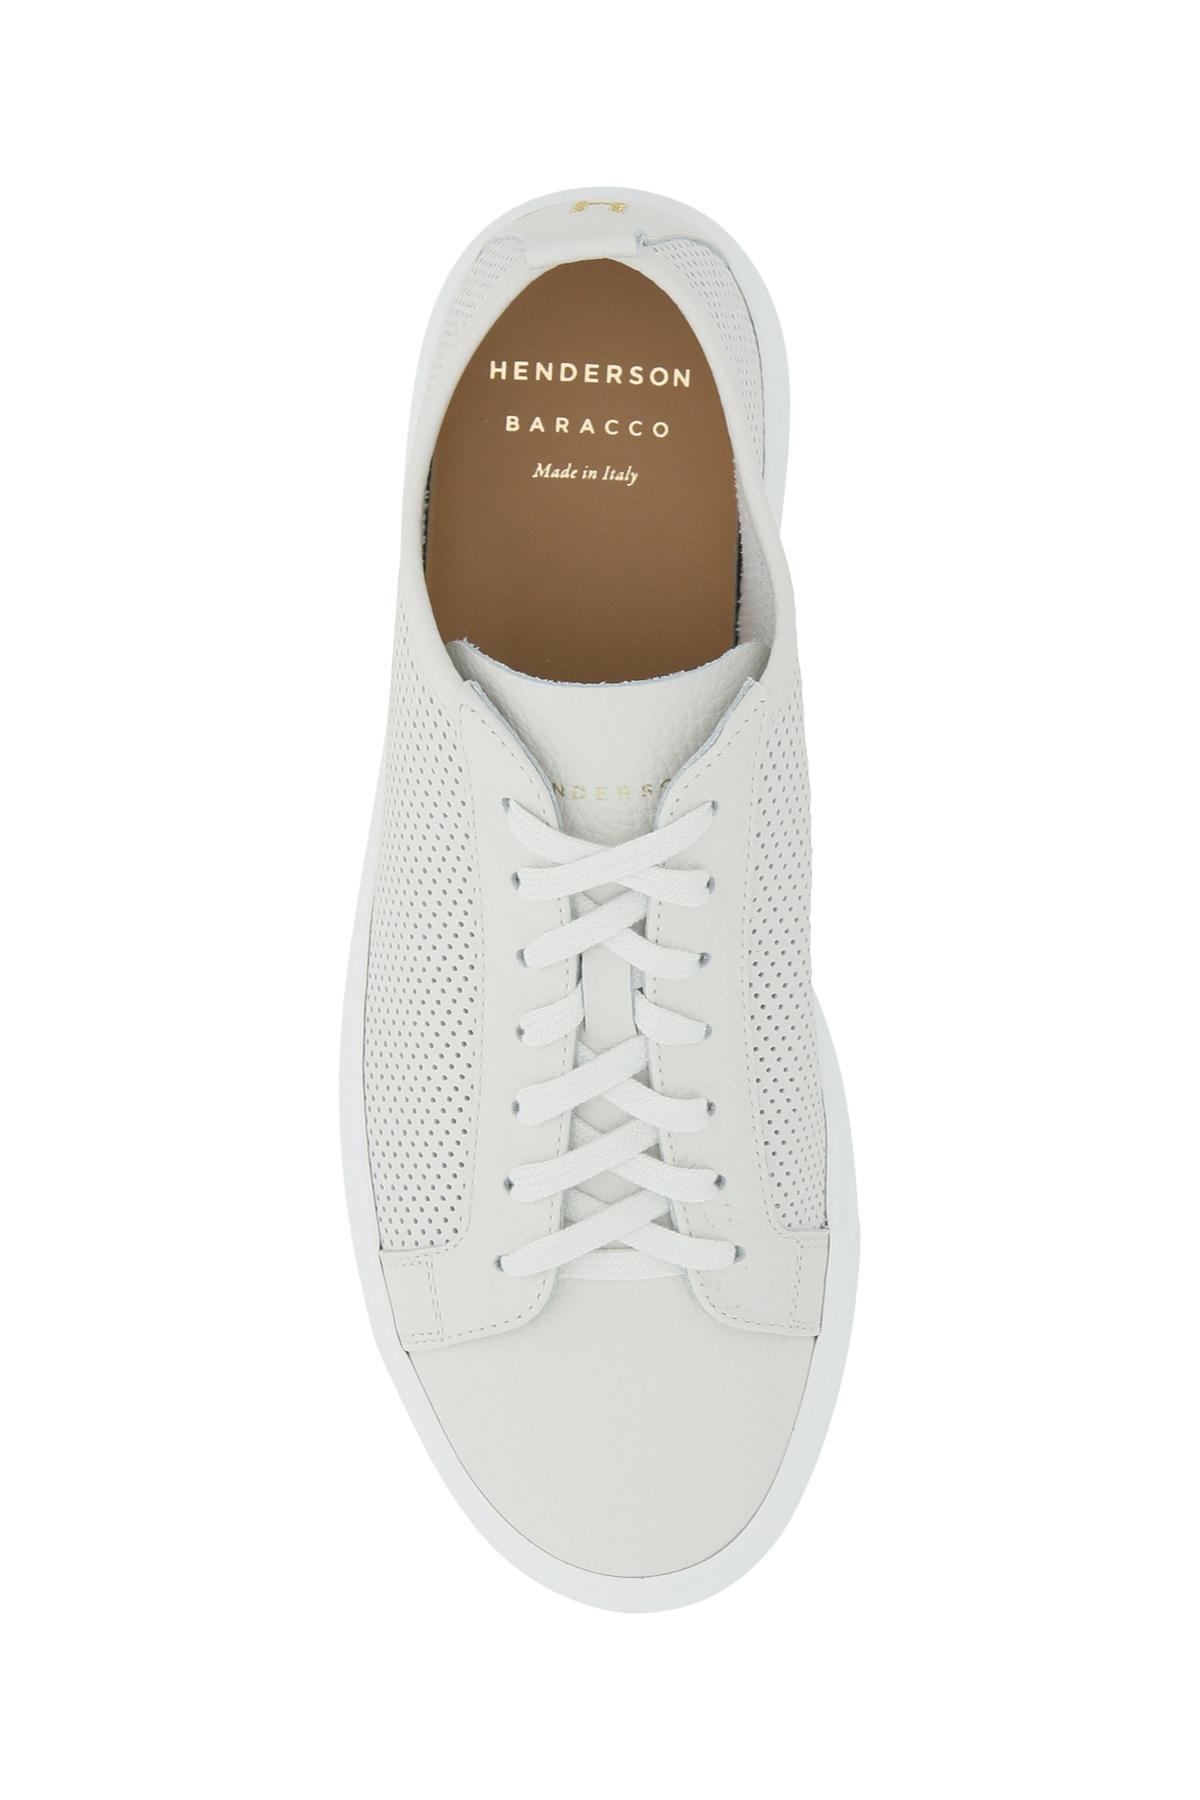 Henderson sneaker traforata roby